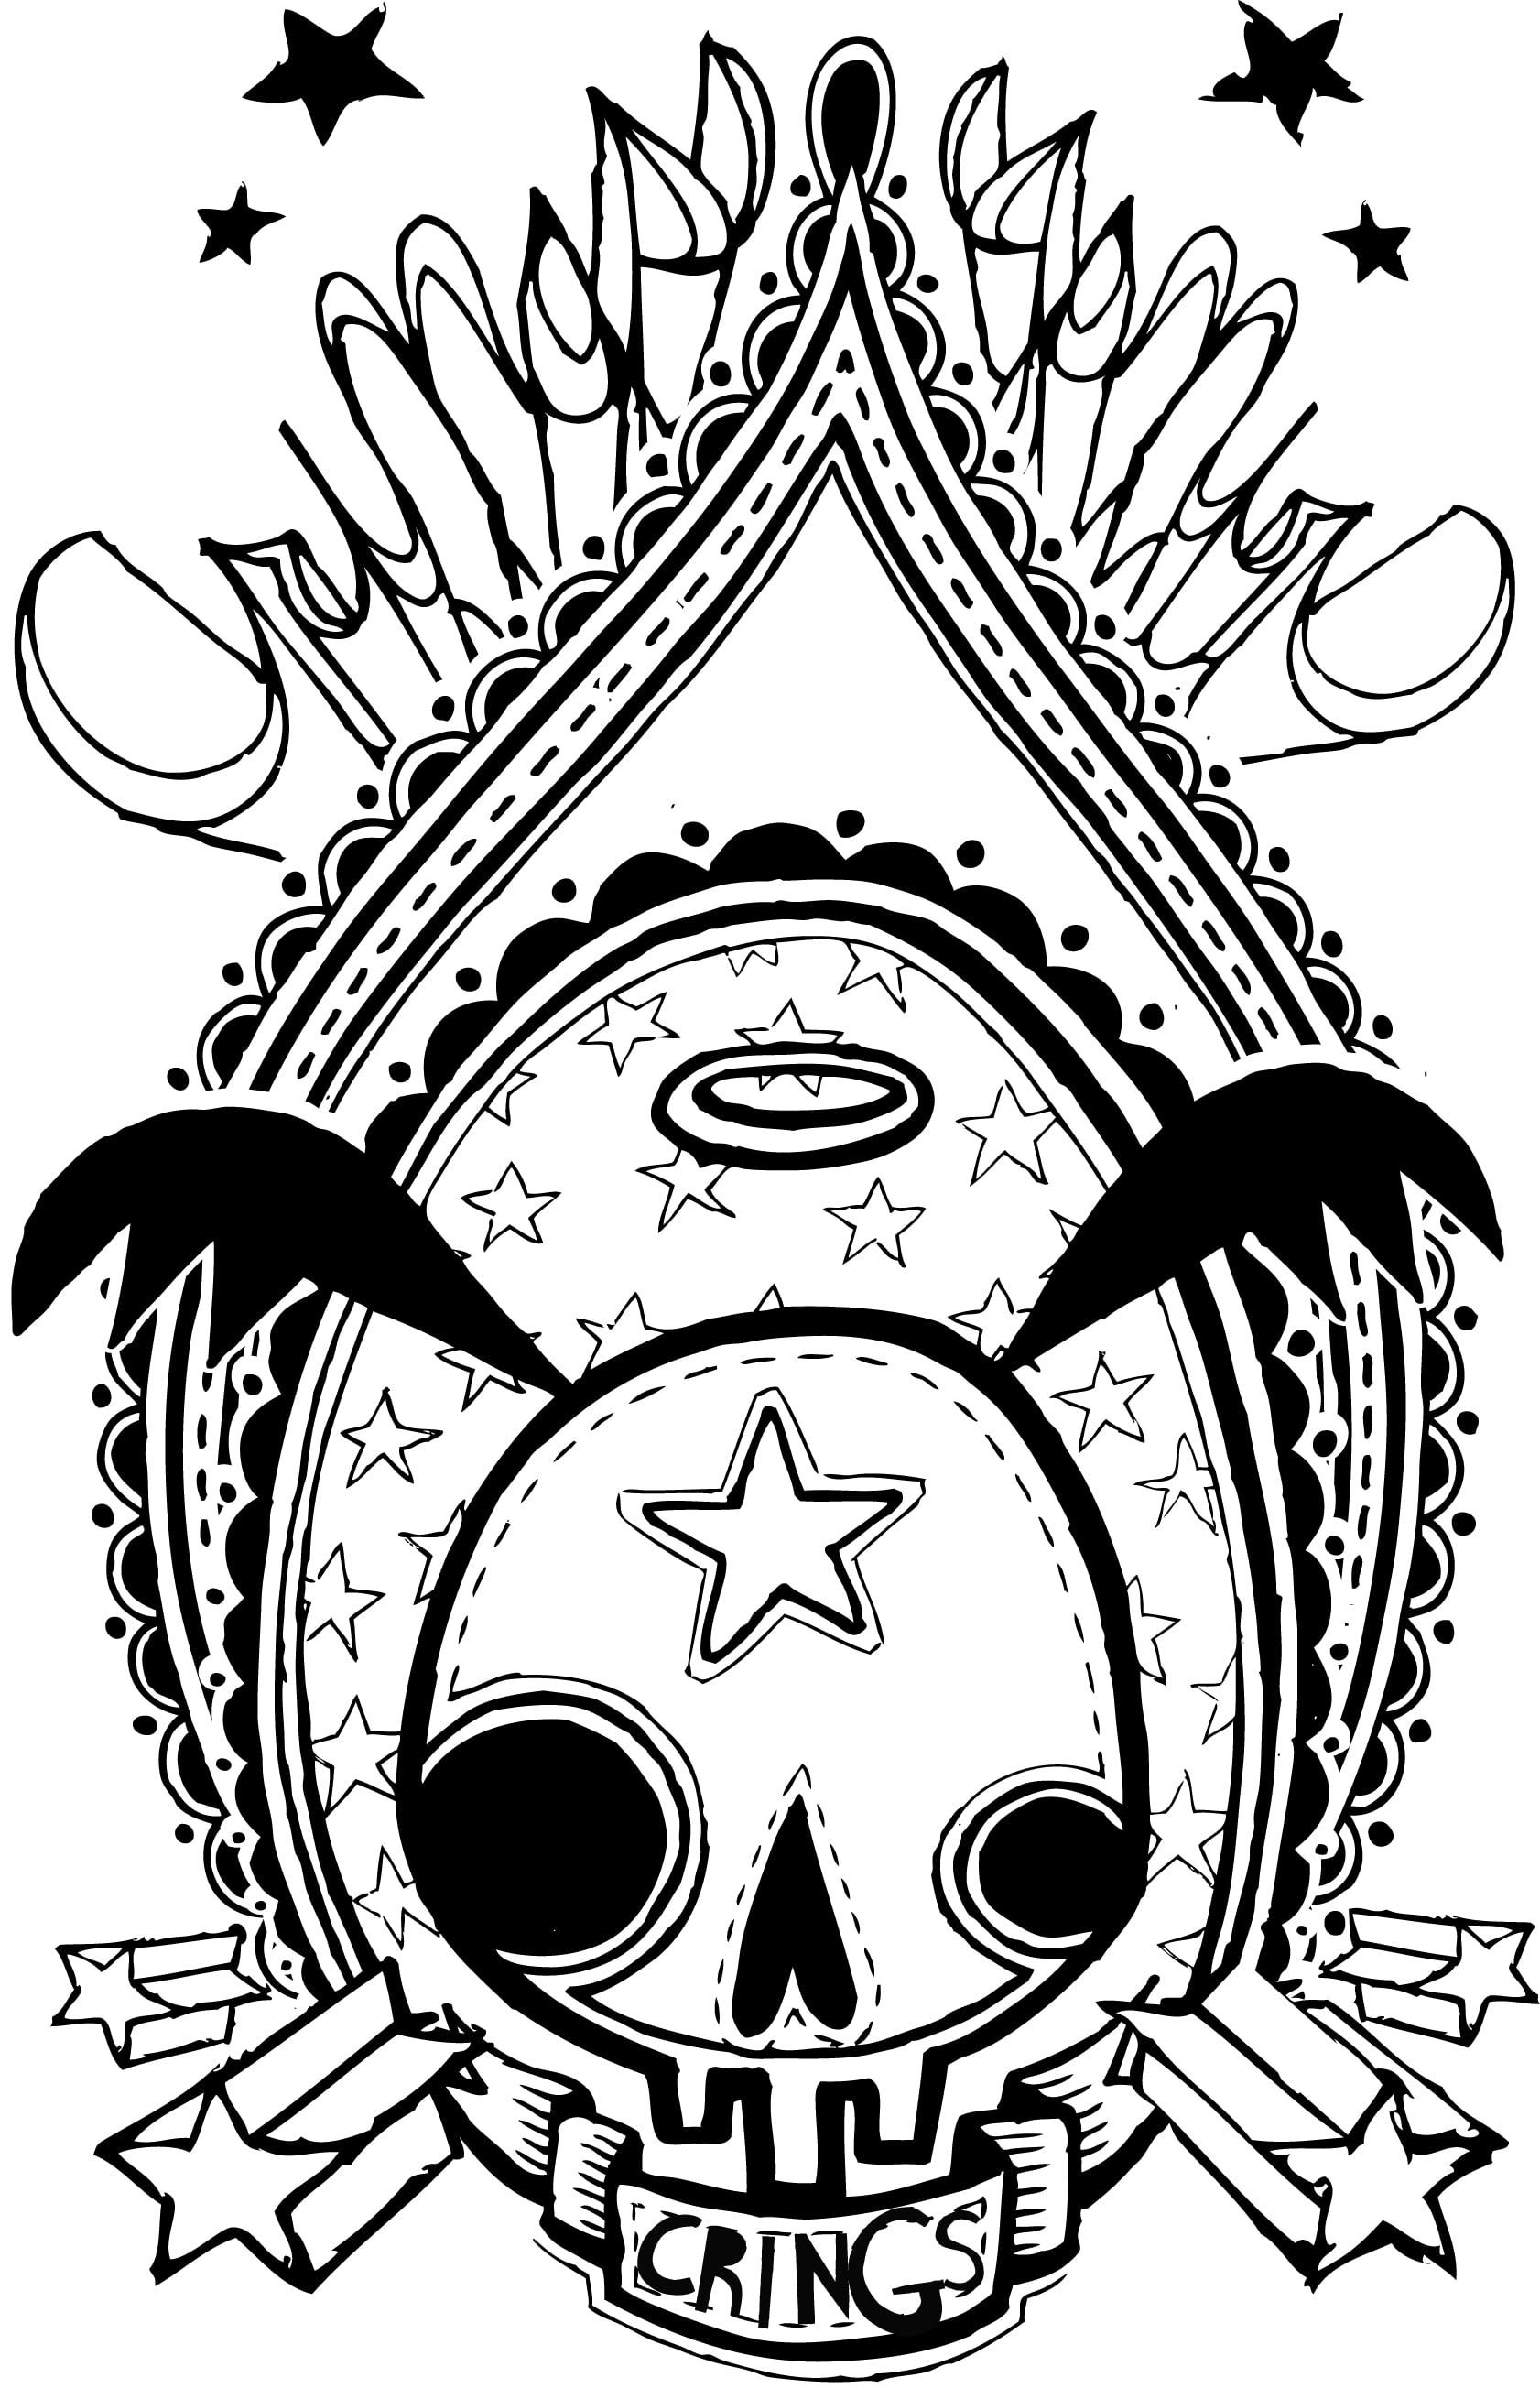 TINDELMICHI: Skulls